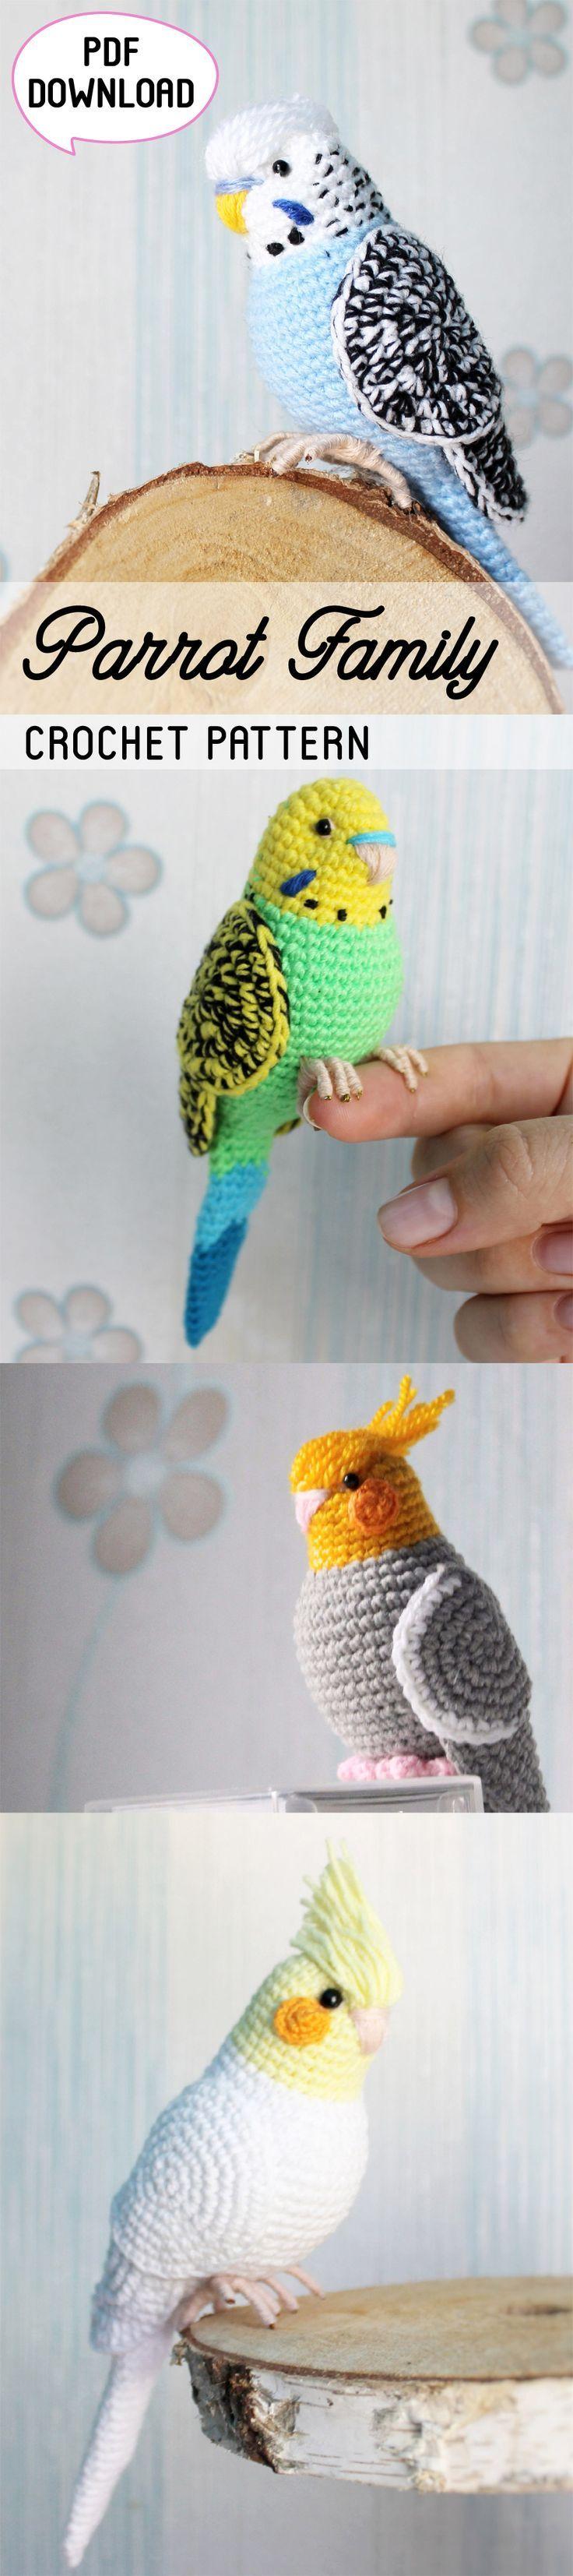 Pin de Hanna-Mári Kershoff en Crochet - Toys | Pinterest | Ganchillo ...